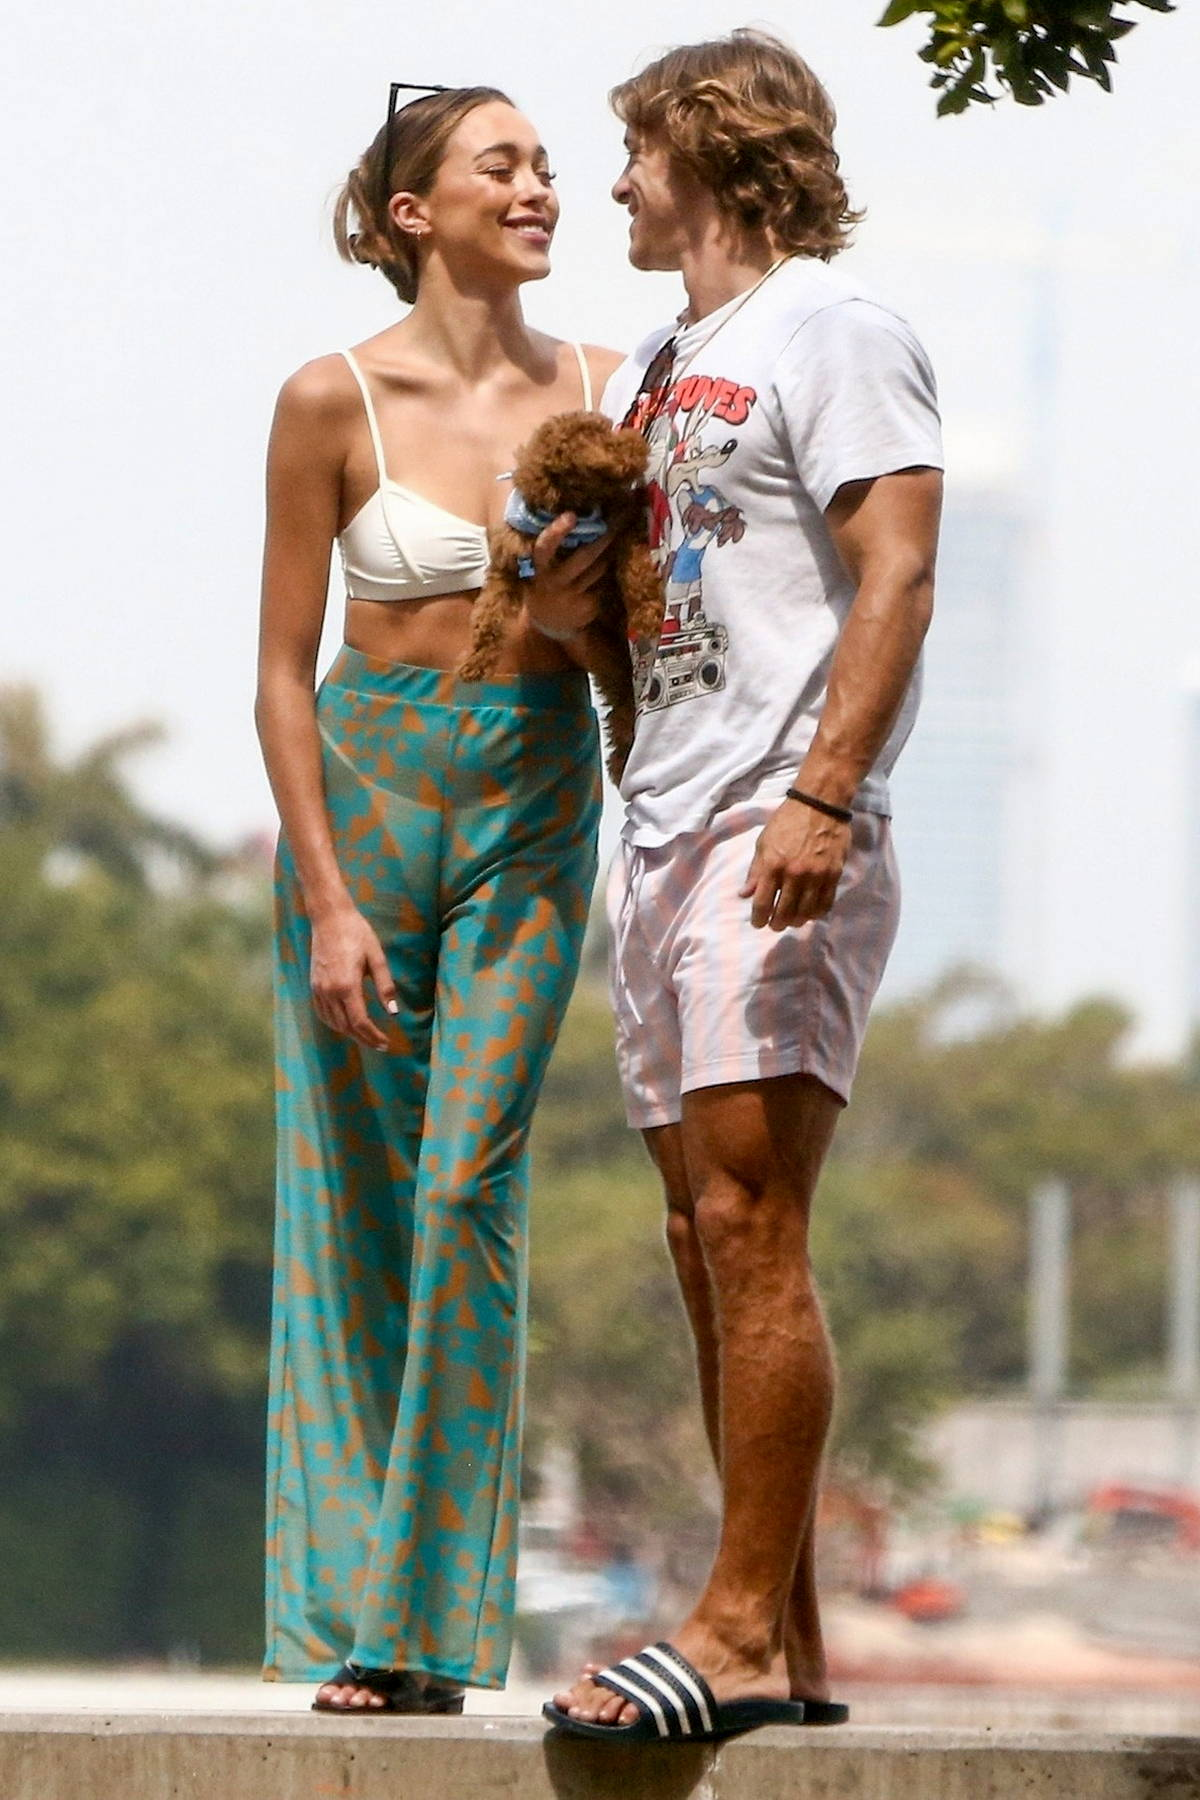 Sophia Culpo and boyfriend Braxton Berrios pose with their pup for a cute photoshoot in Miami Beach, Florida